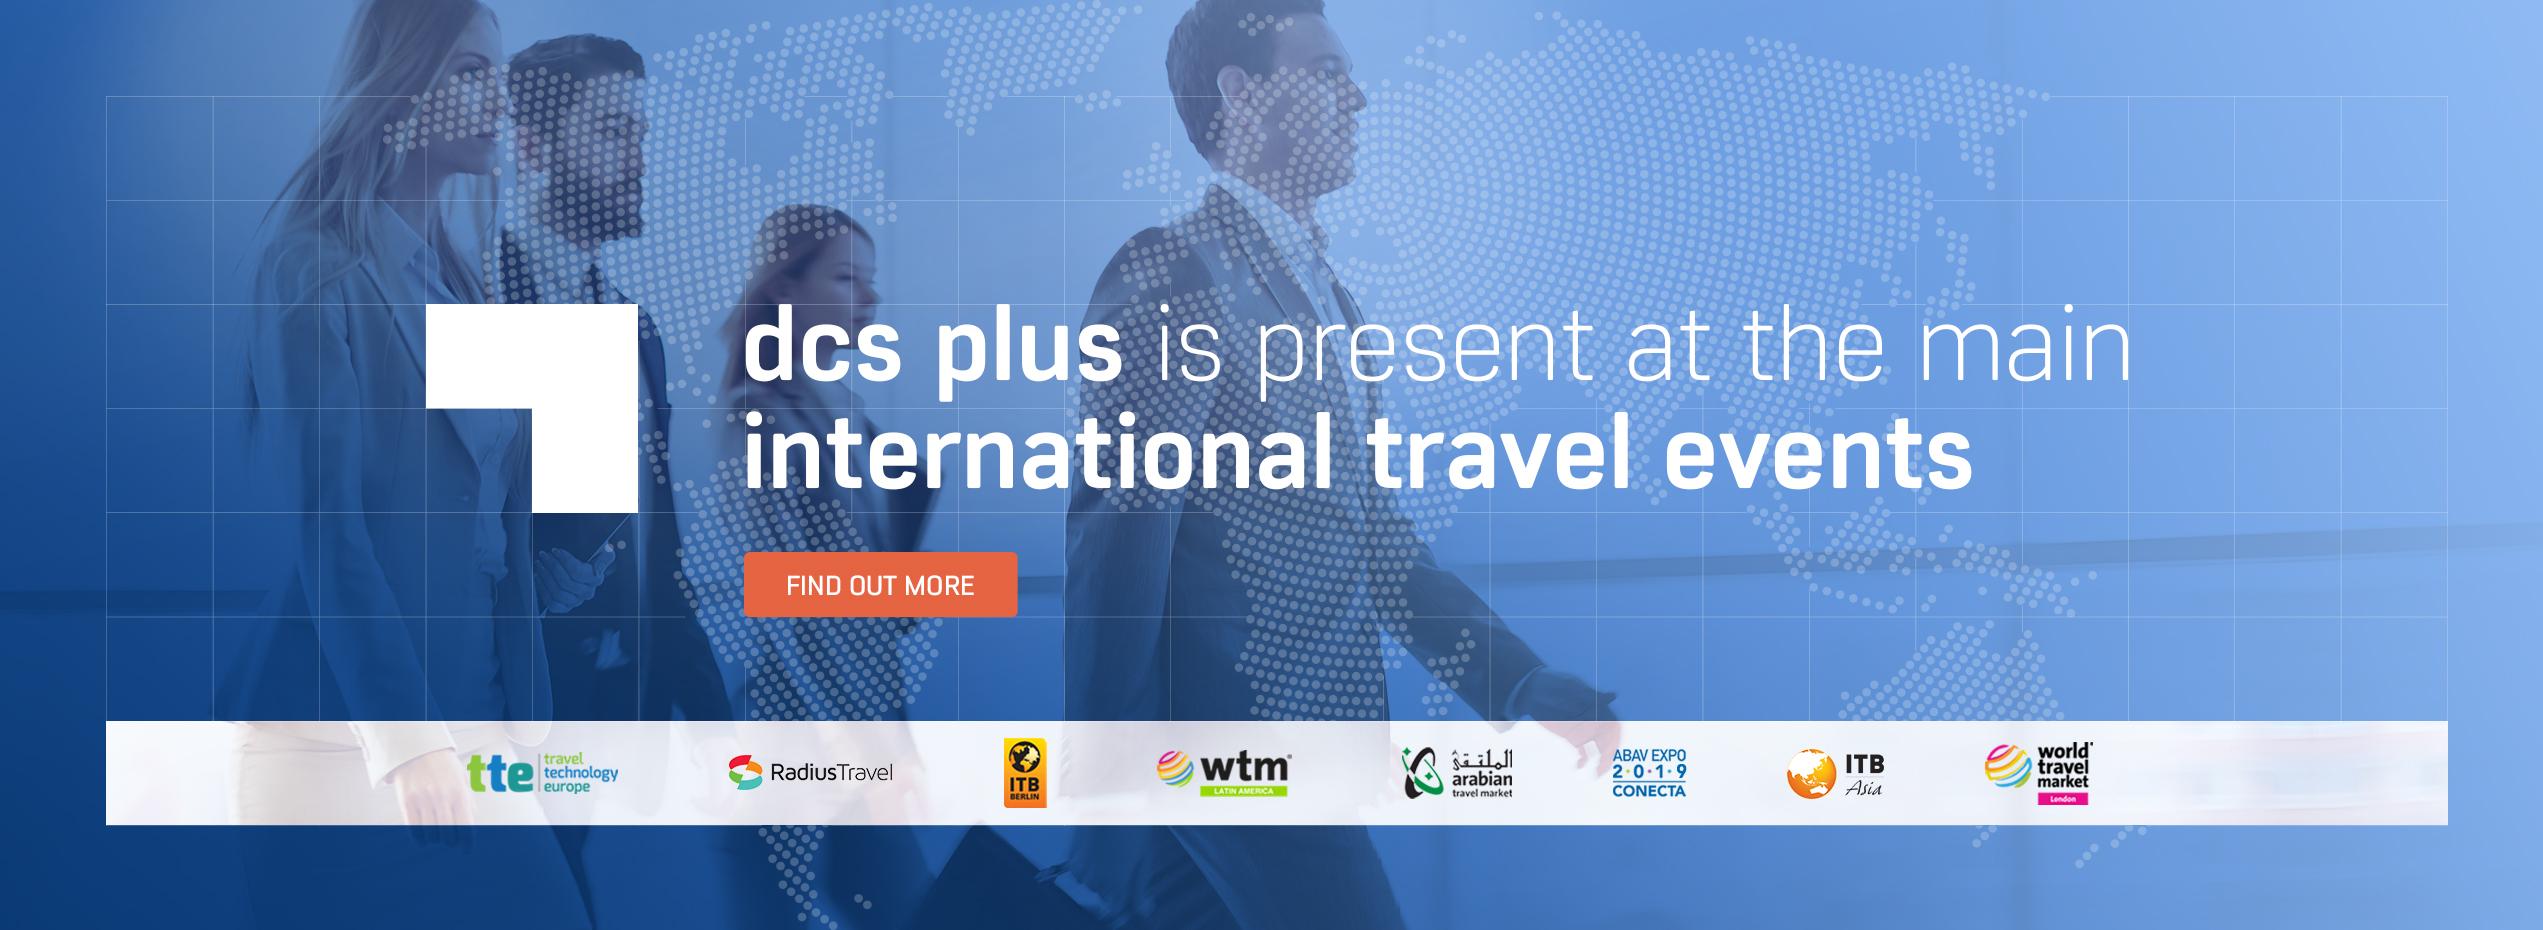 International events 2019